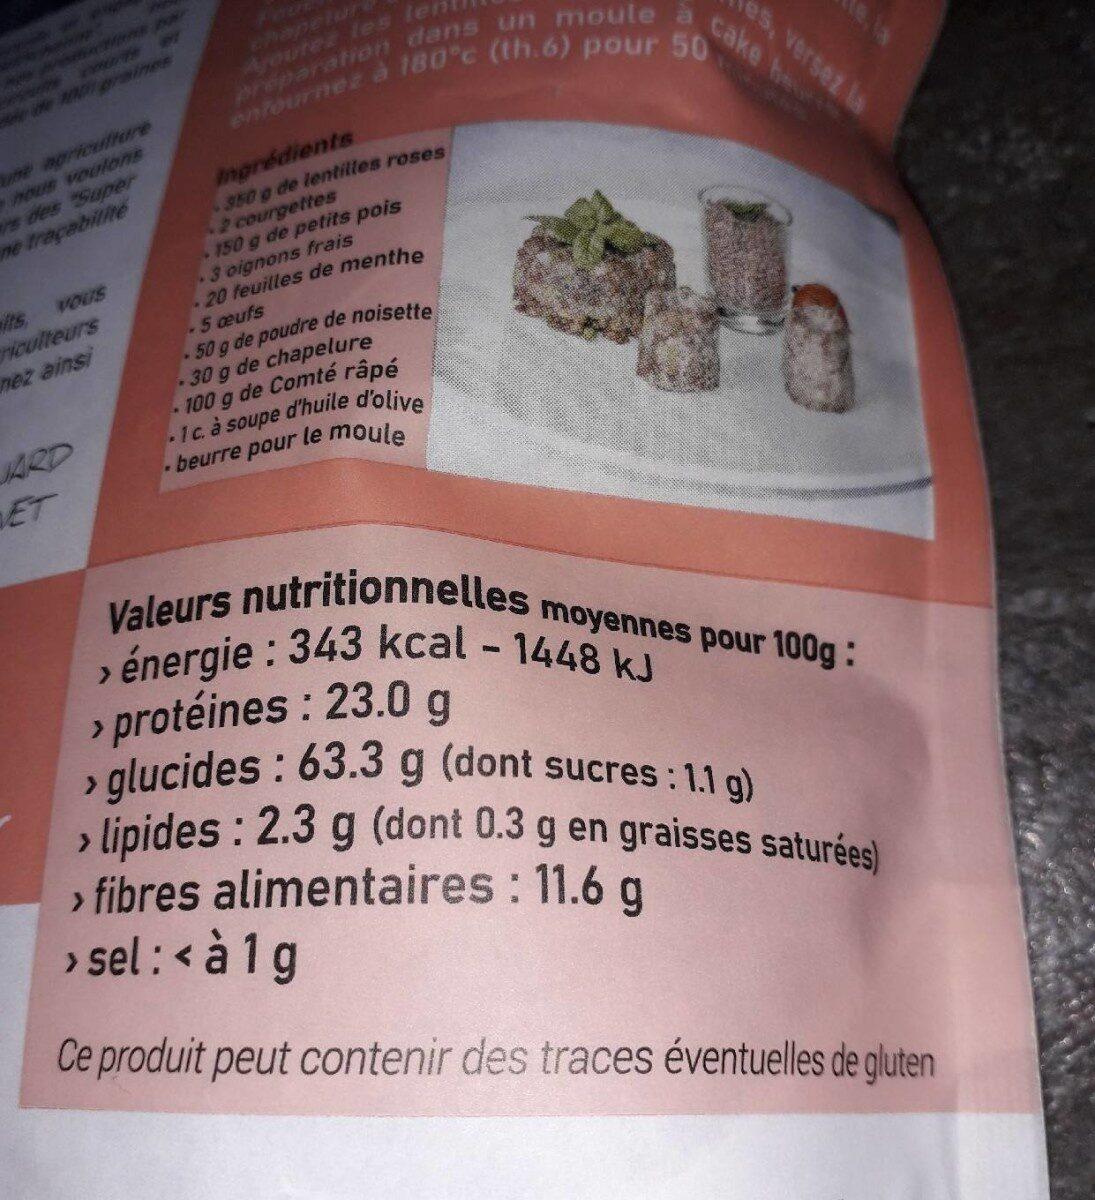 Lentilles roses - Nutrition facts - fr